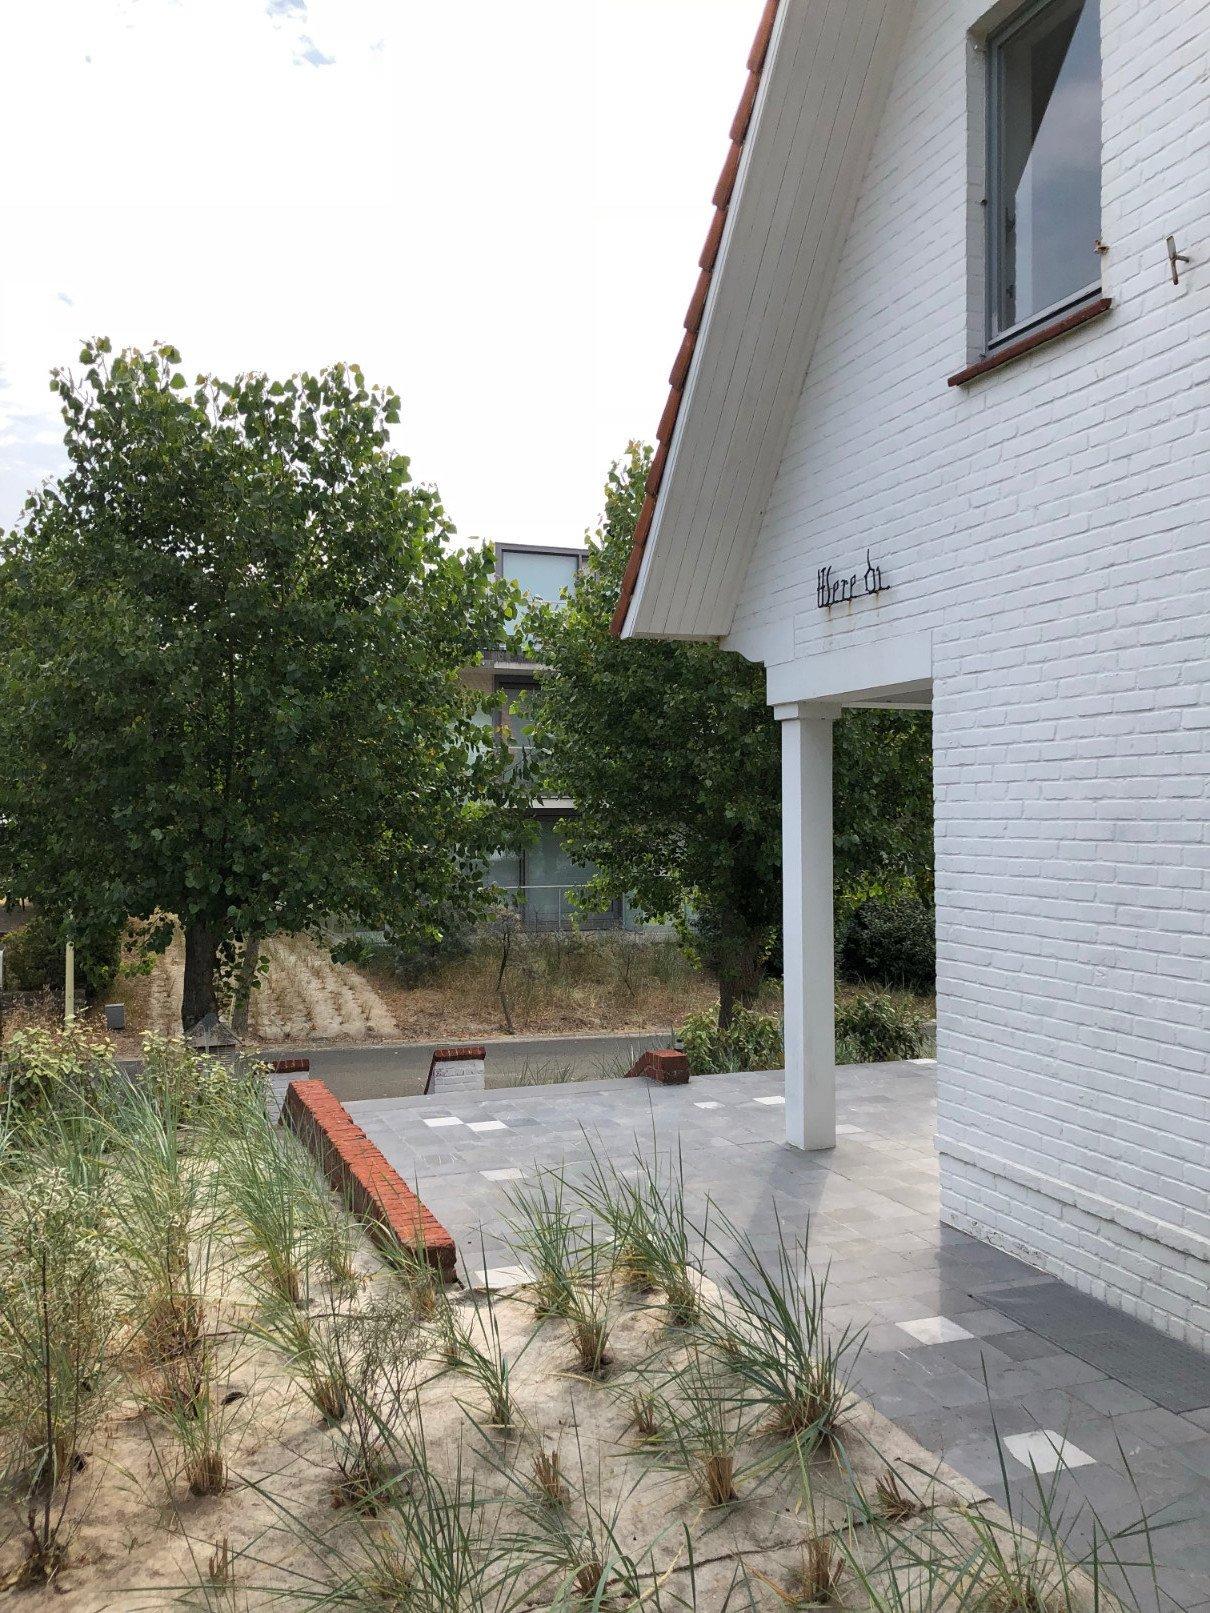 Rietveldprojects-Villa Were Di - Te Koop : Te Huur (per week)26